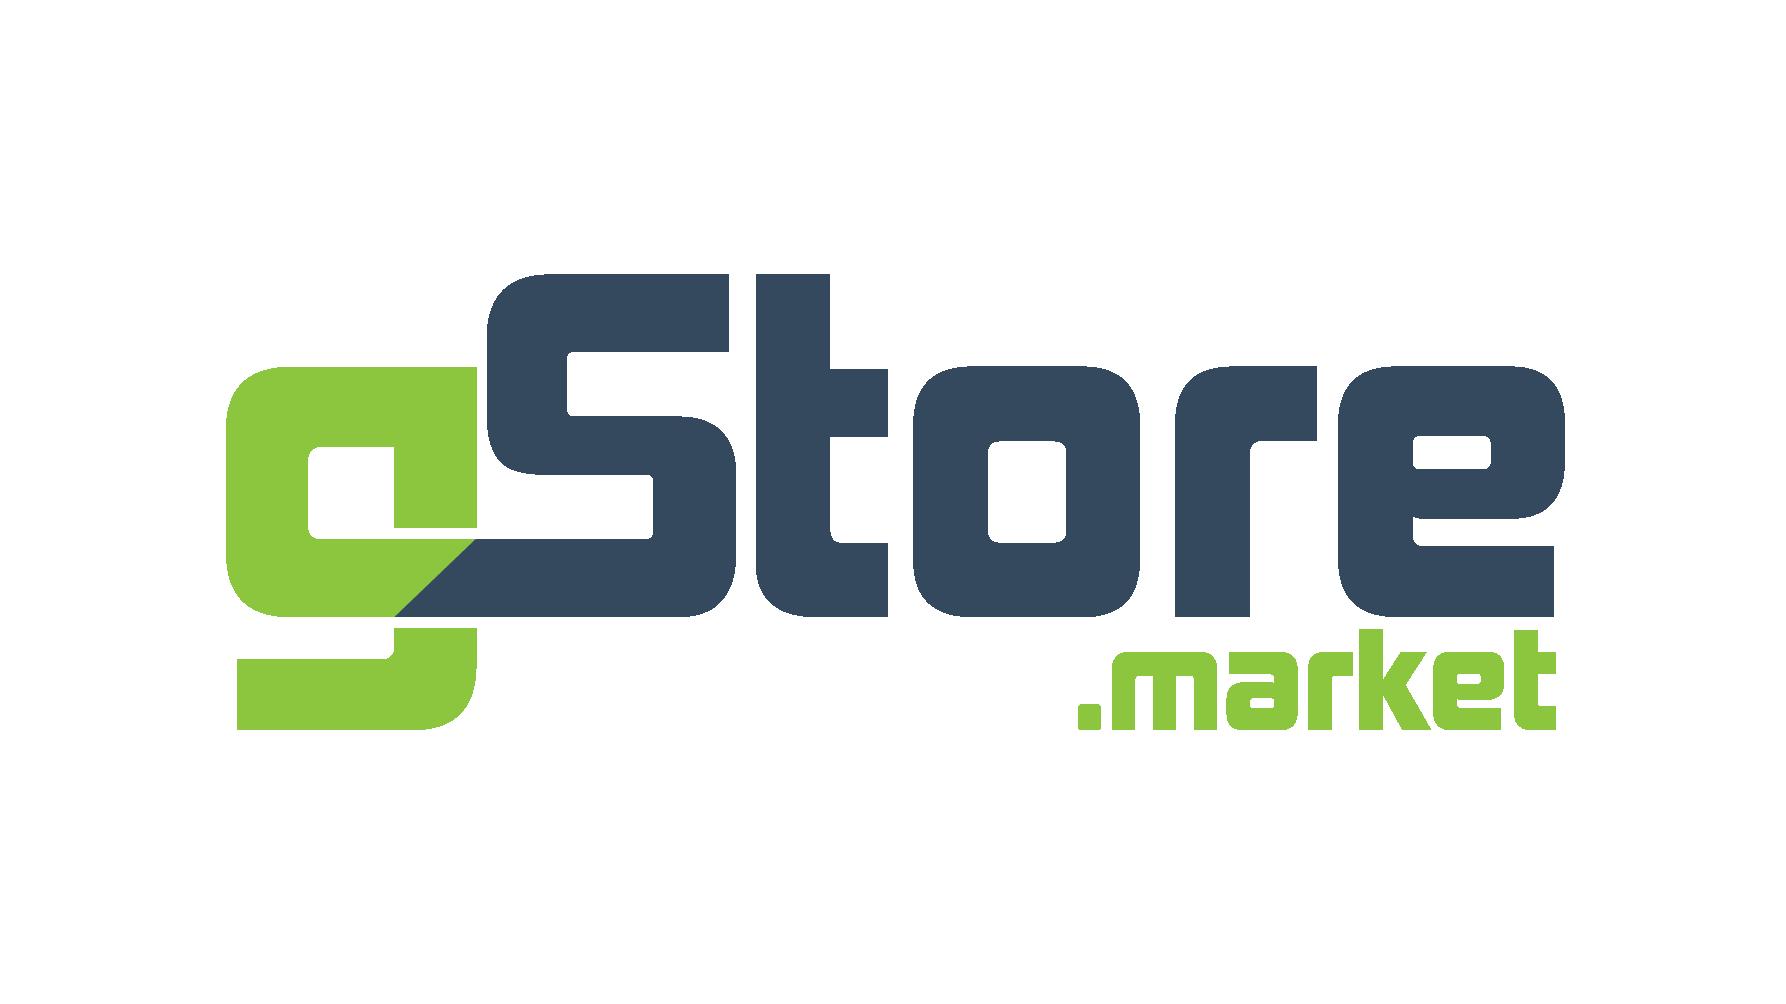 gStore-market